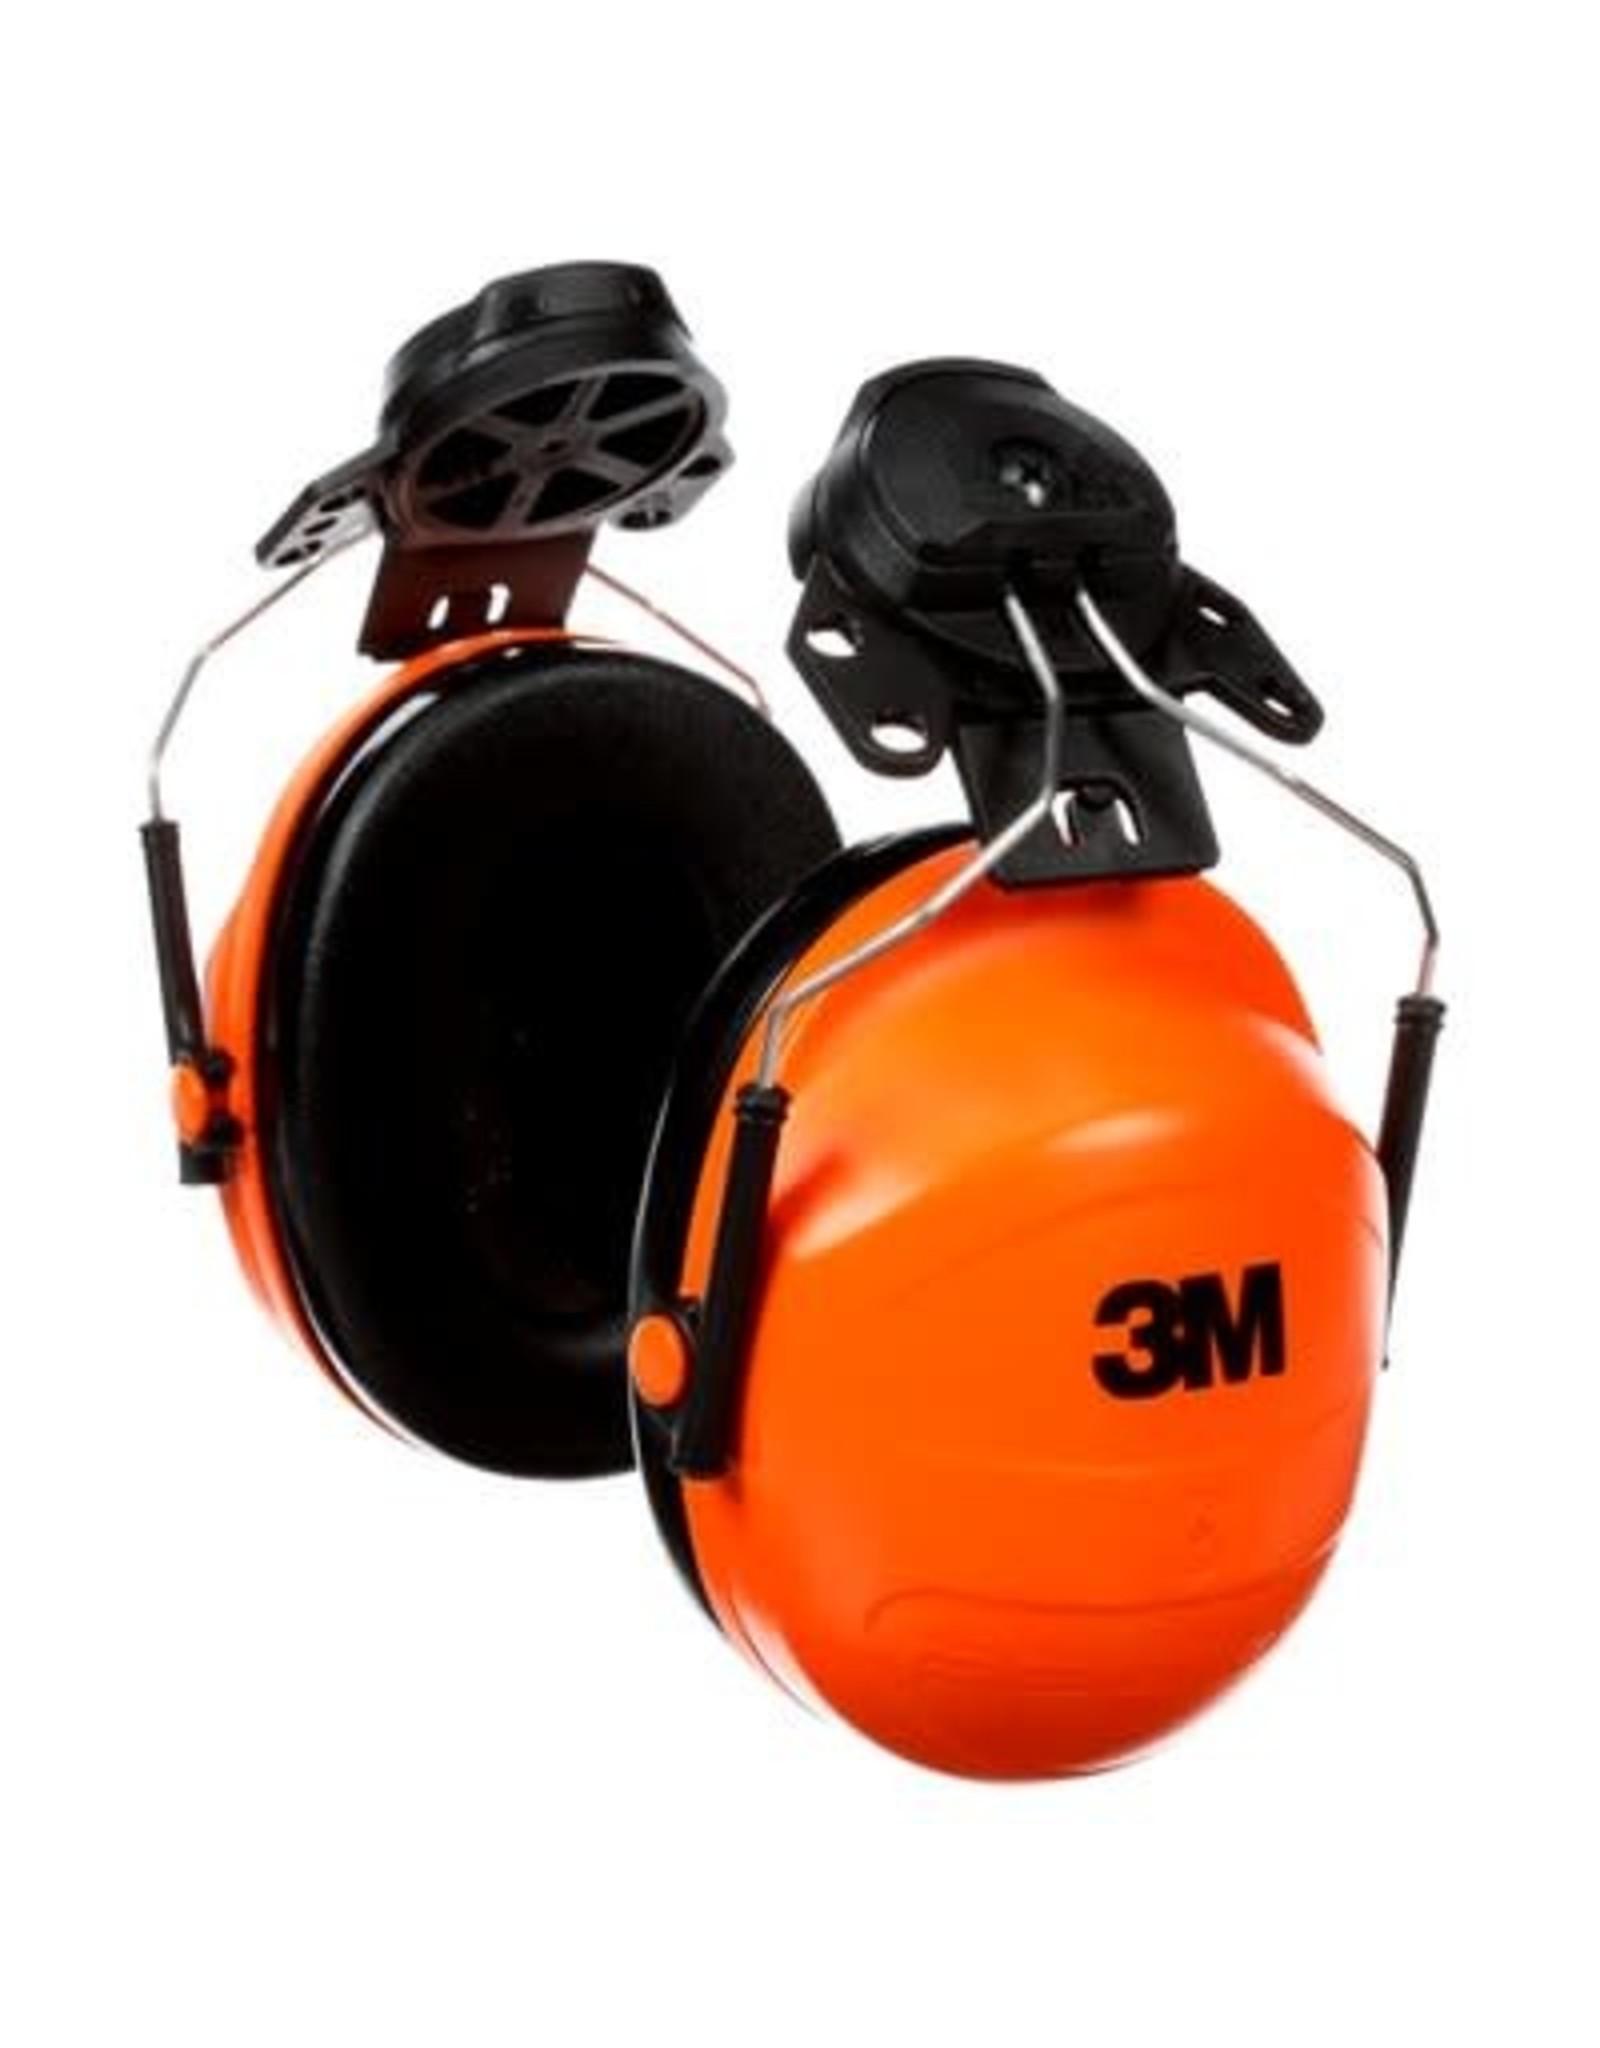 3M Peltor™ Earmuff Universal High Visibility